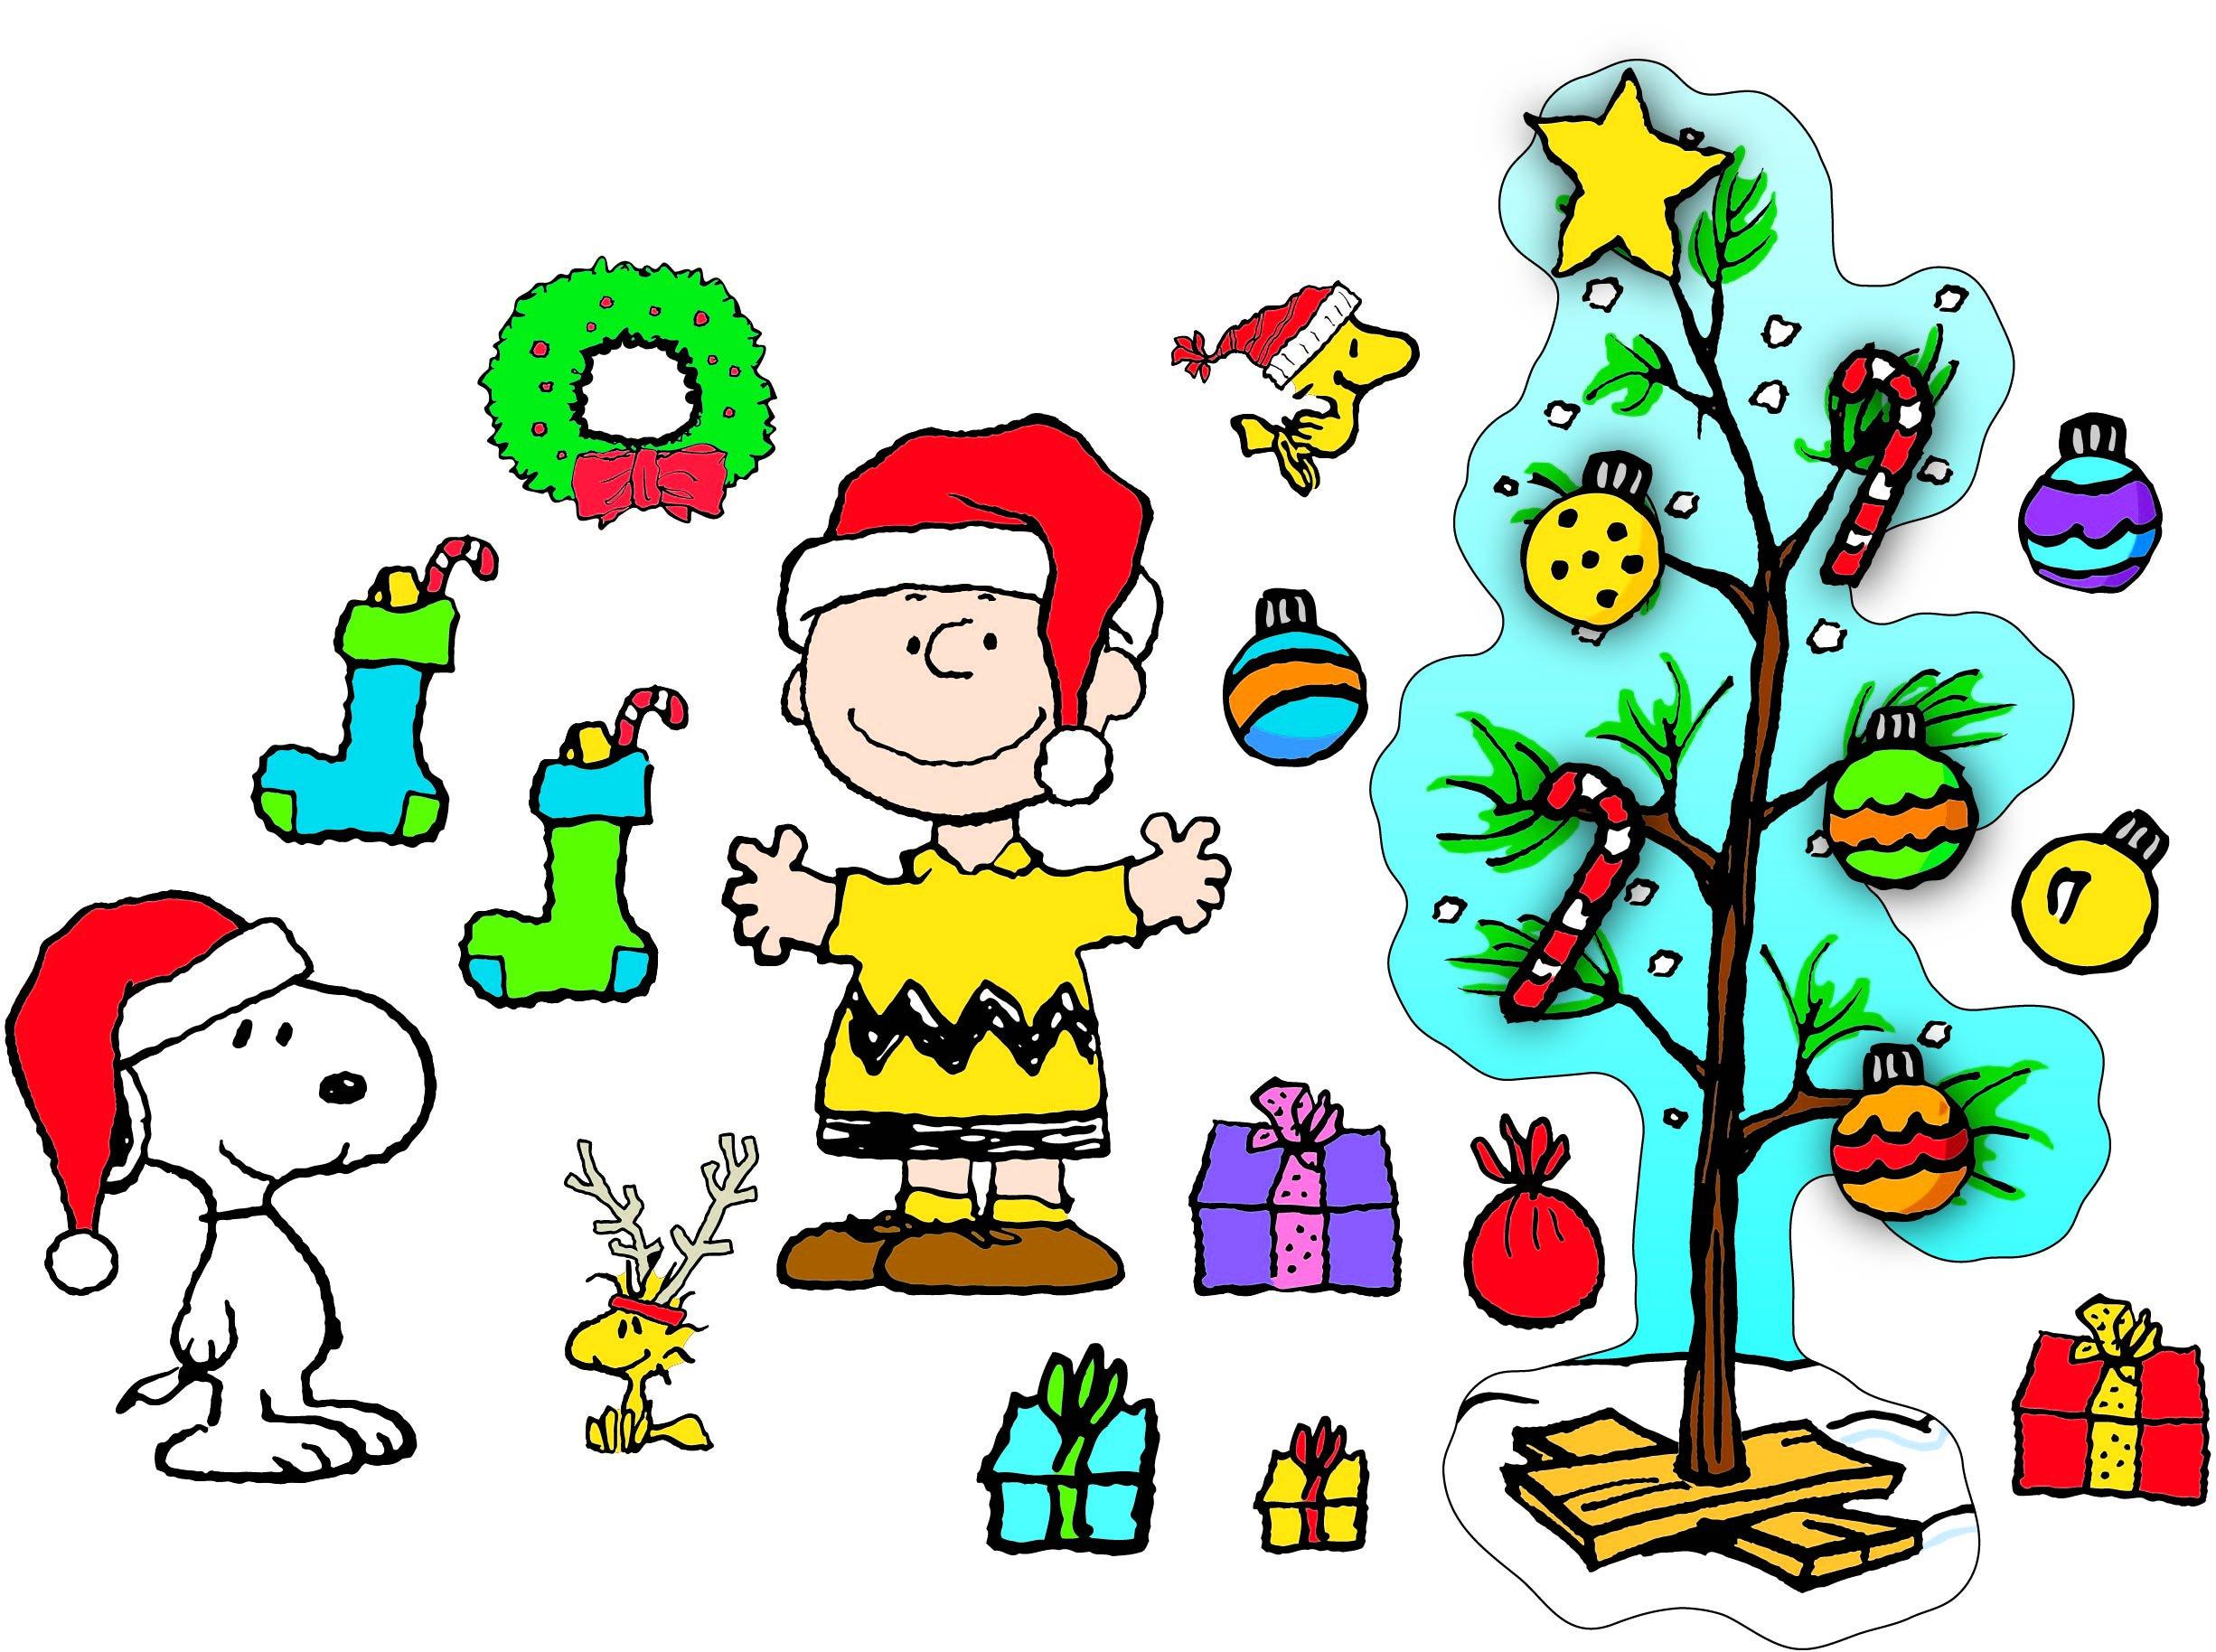 Amazon.com : Eureka A Charlie Brown Christmas Bulletin Board Sets ...